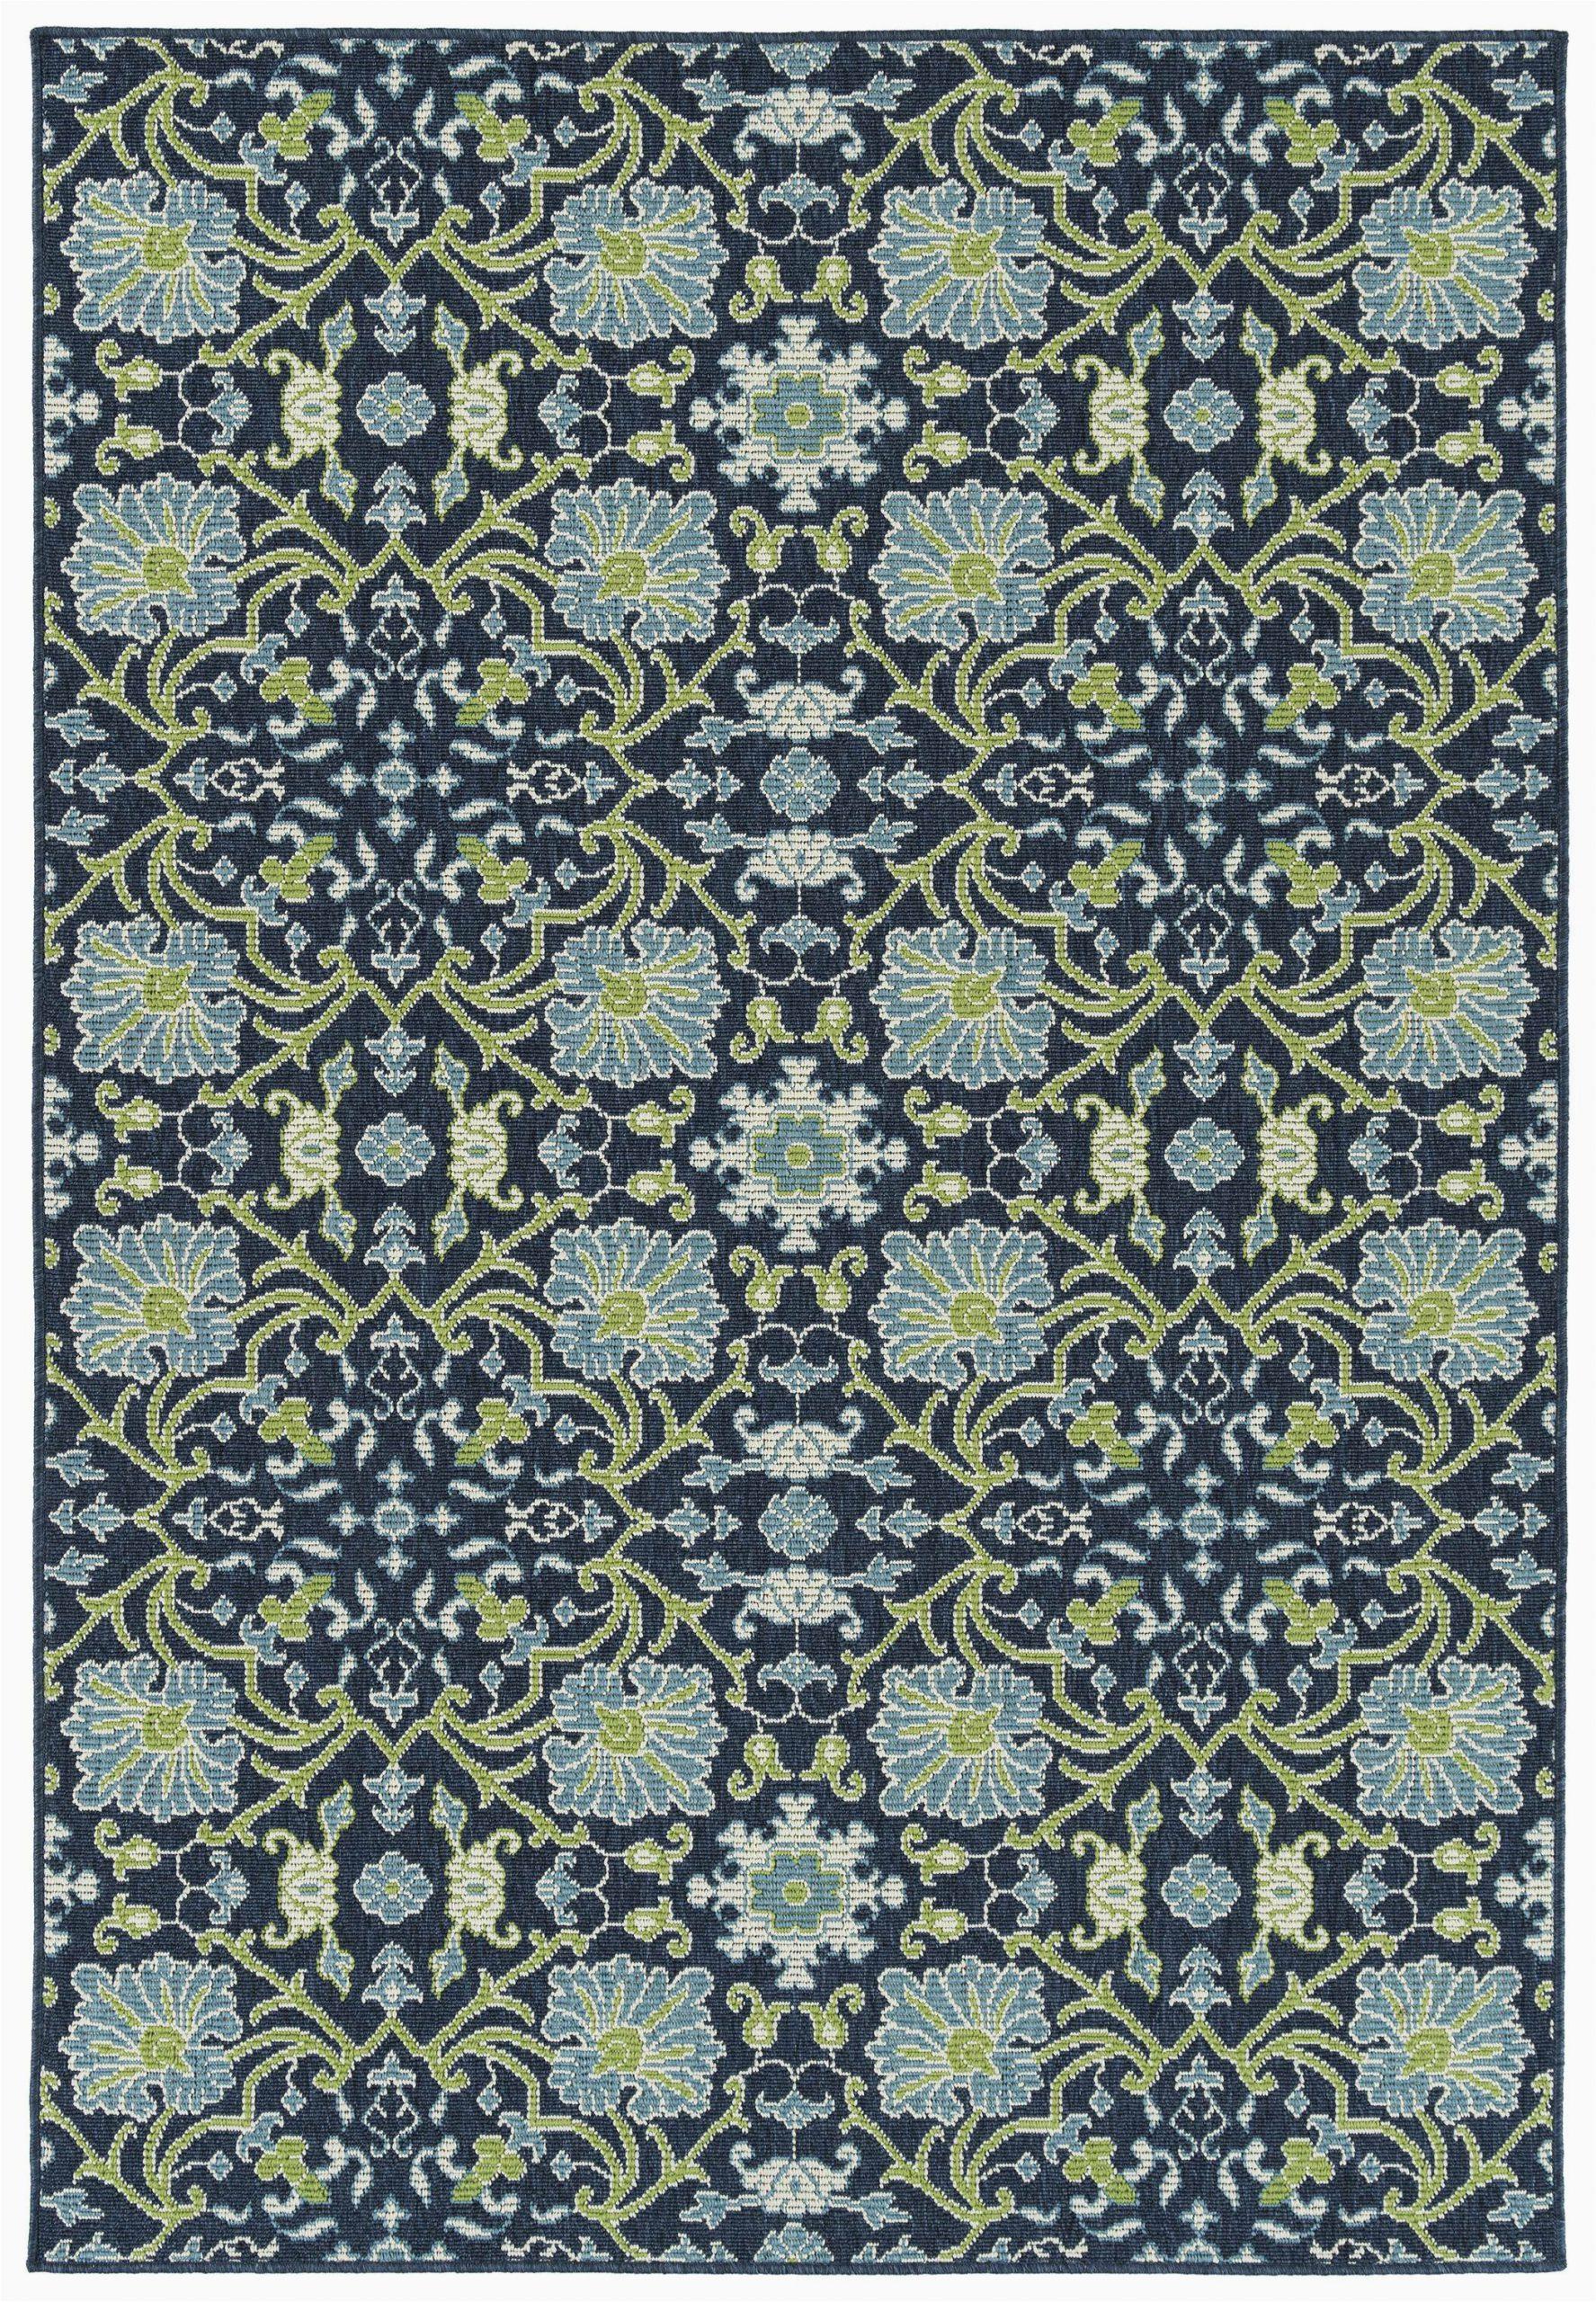 canora grey kirsty navy indooroutdoor area rug w piid=